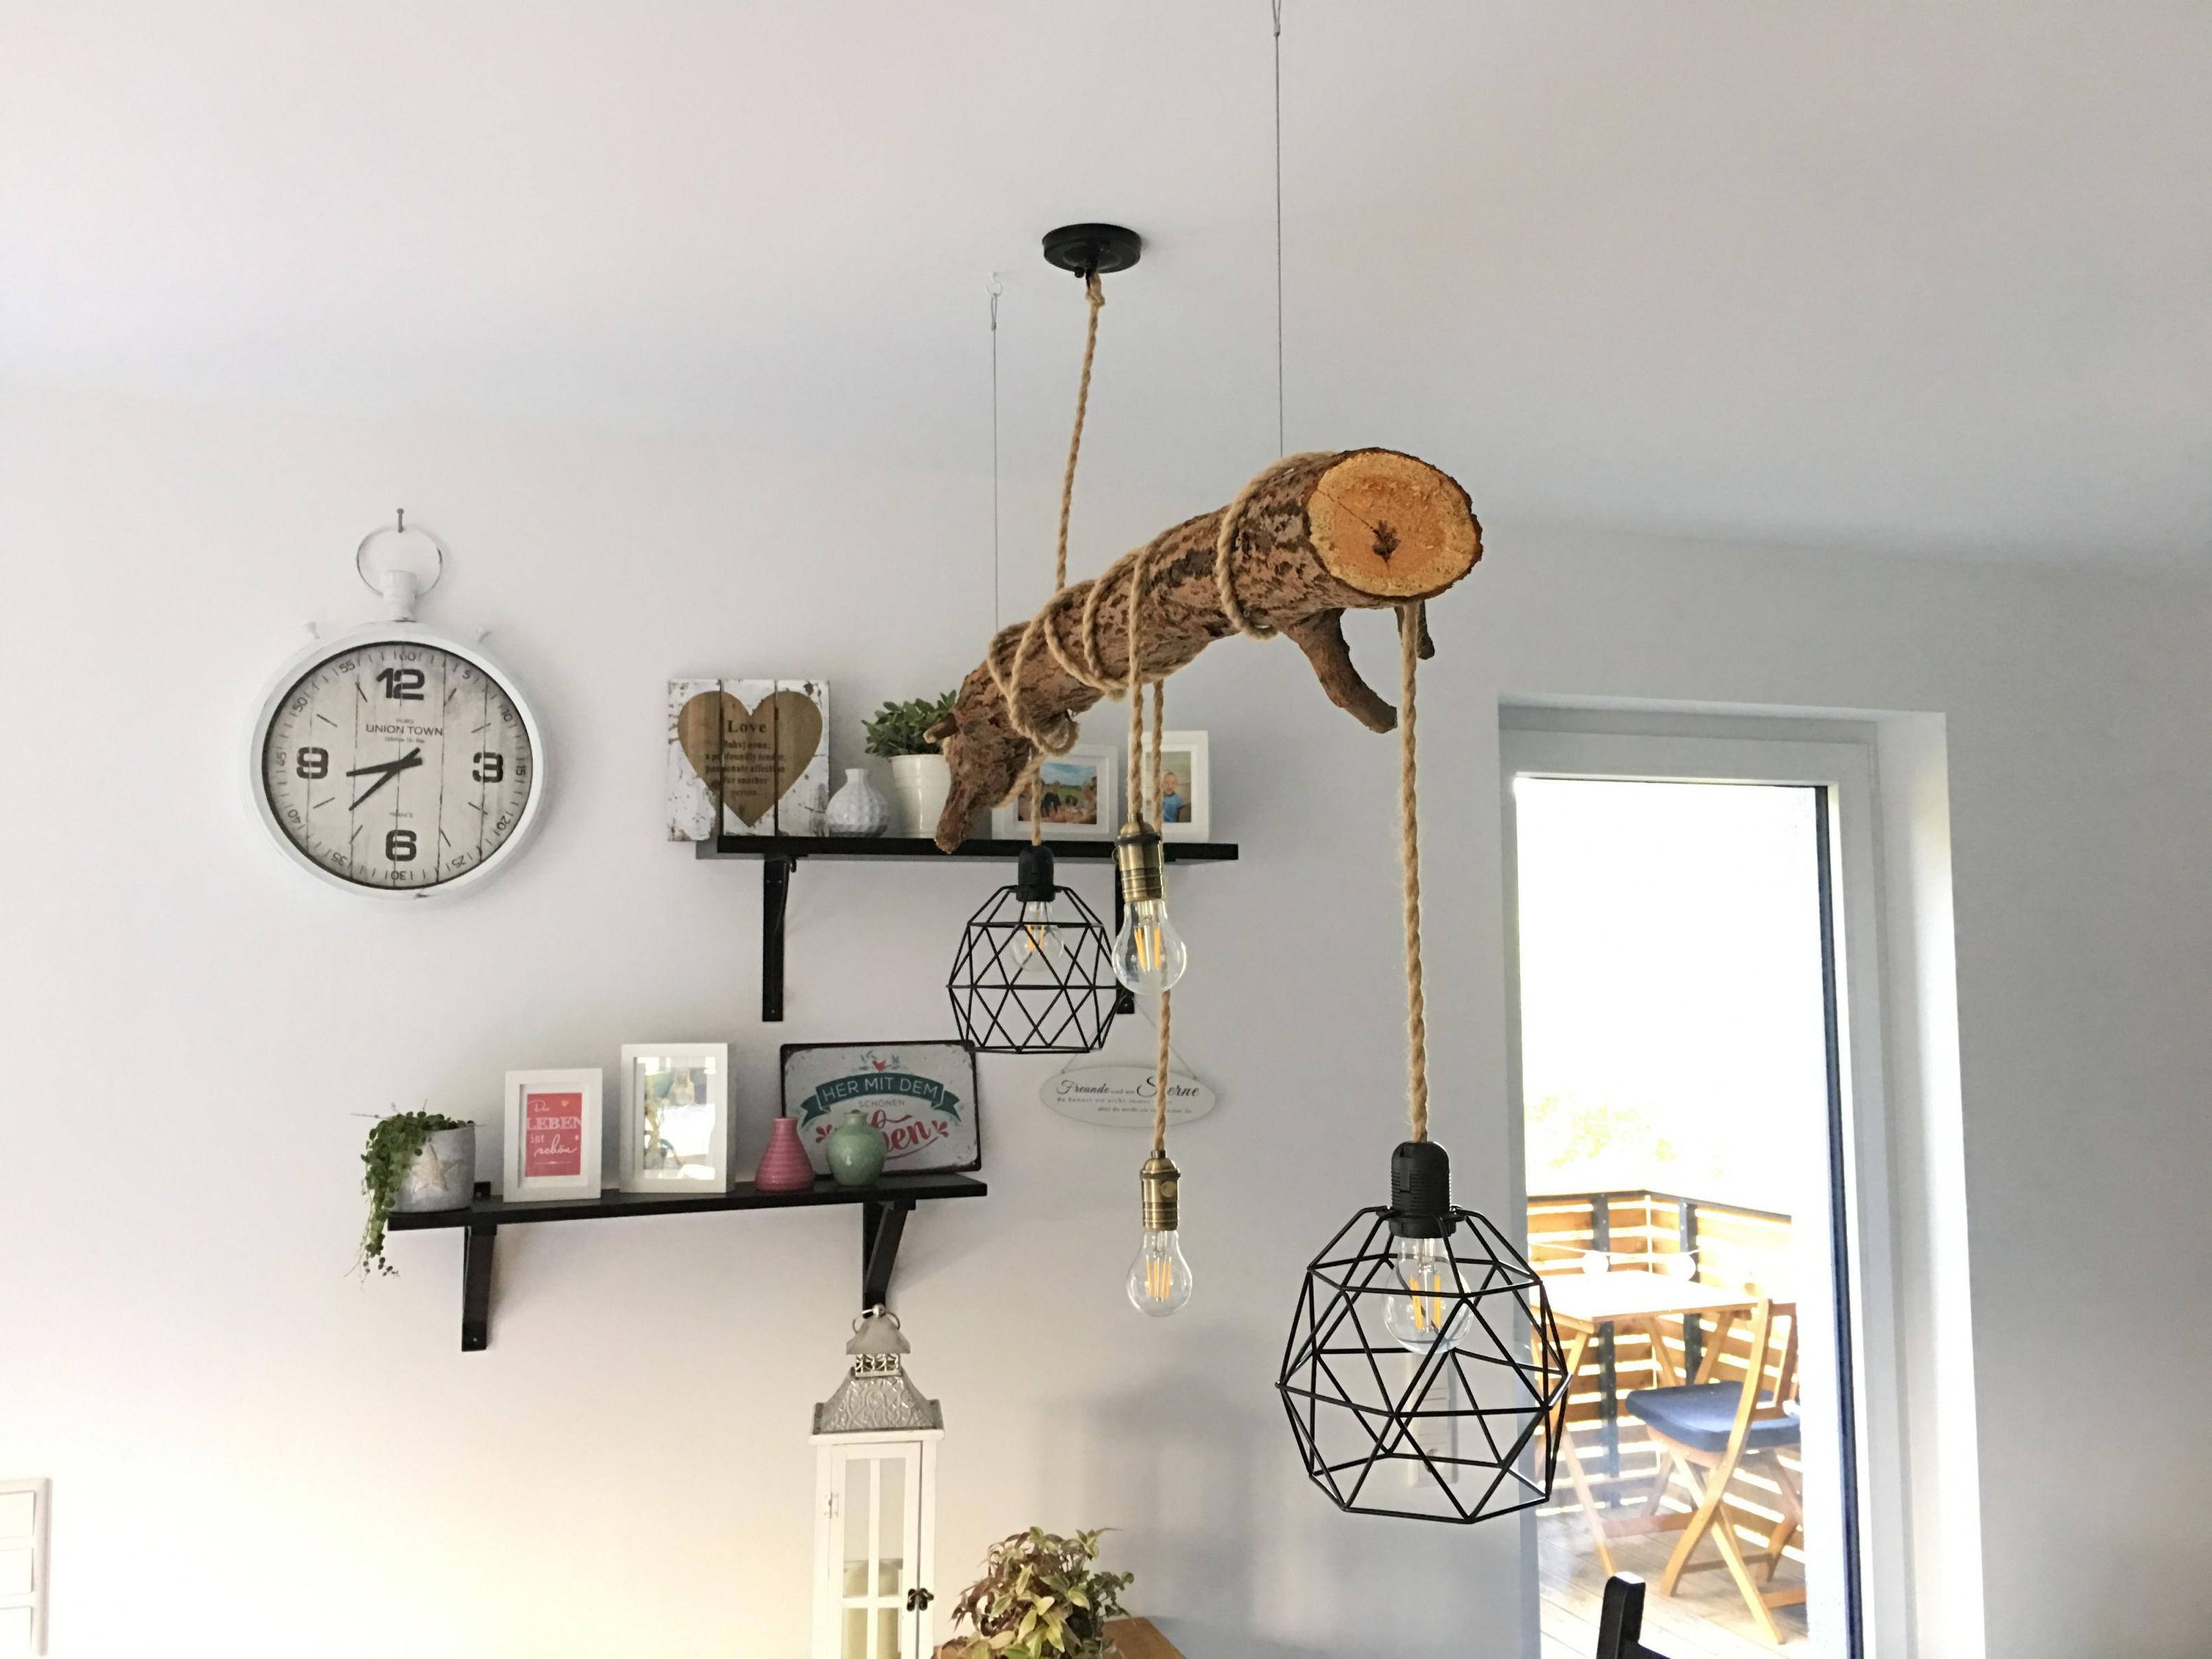 Led Lampe Holz Ast Vintage Esstisch Diy Wood  Lampe Holz von Wohnzimmer Lampe Holzbalken Photo